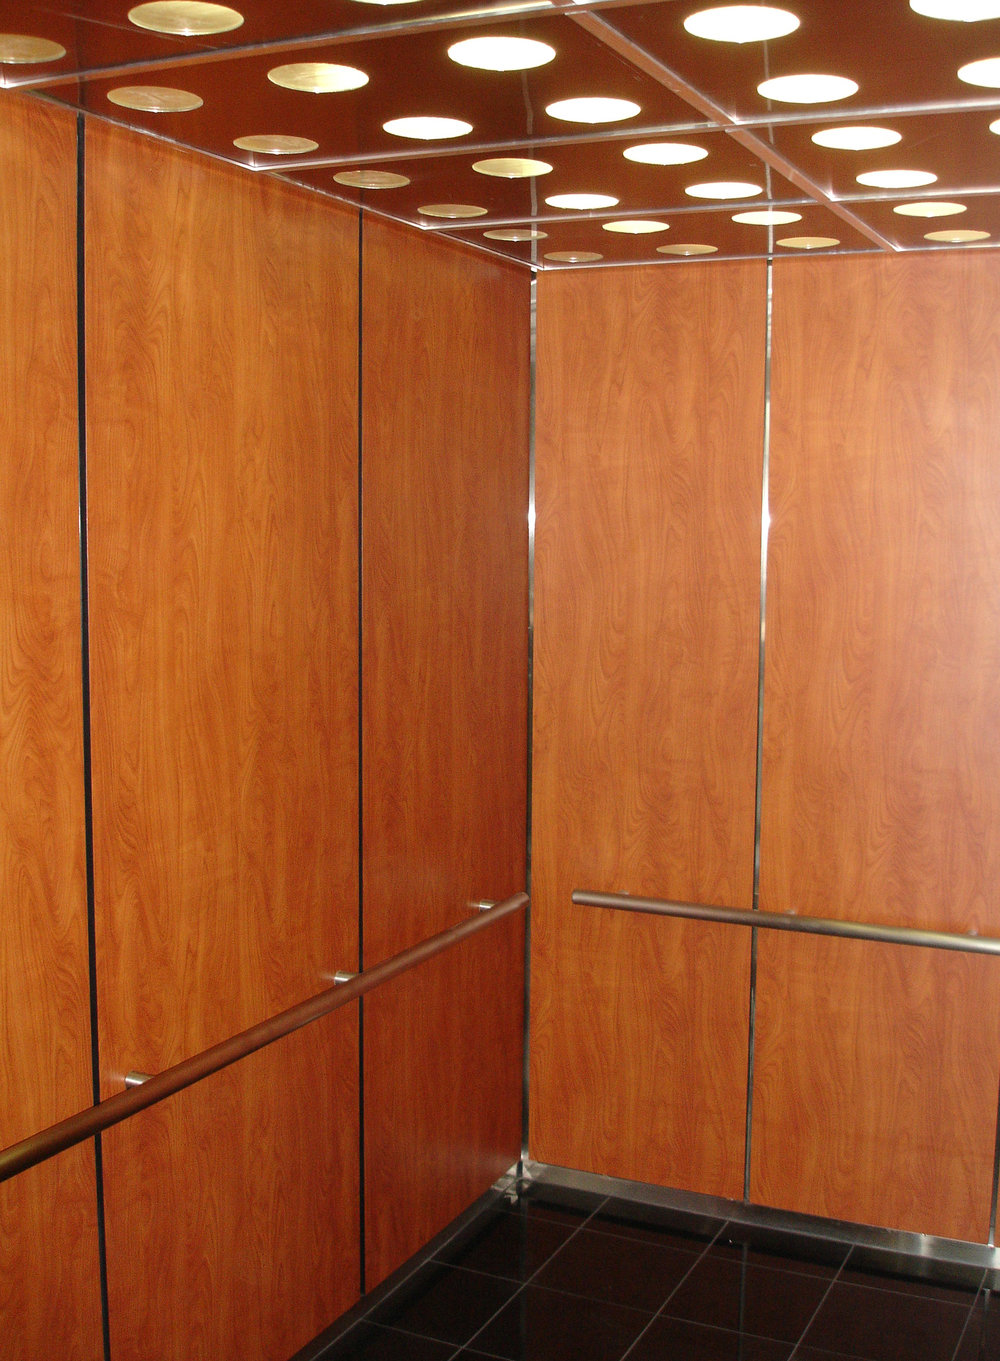 Panasonic 01.14 - Elevator Cab.JPG